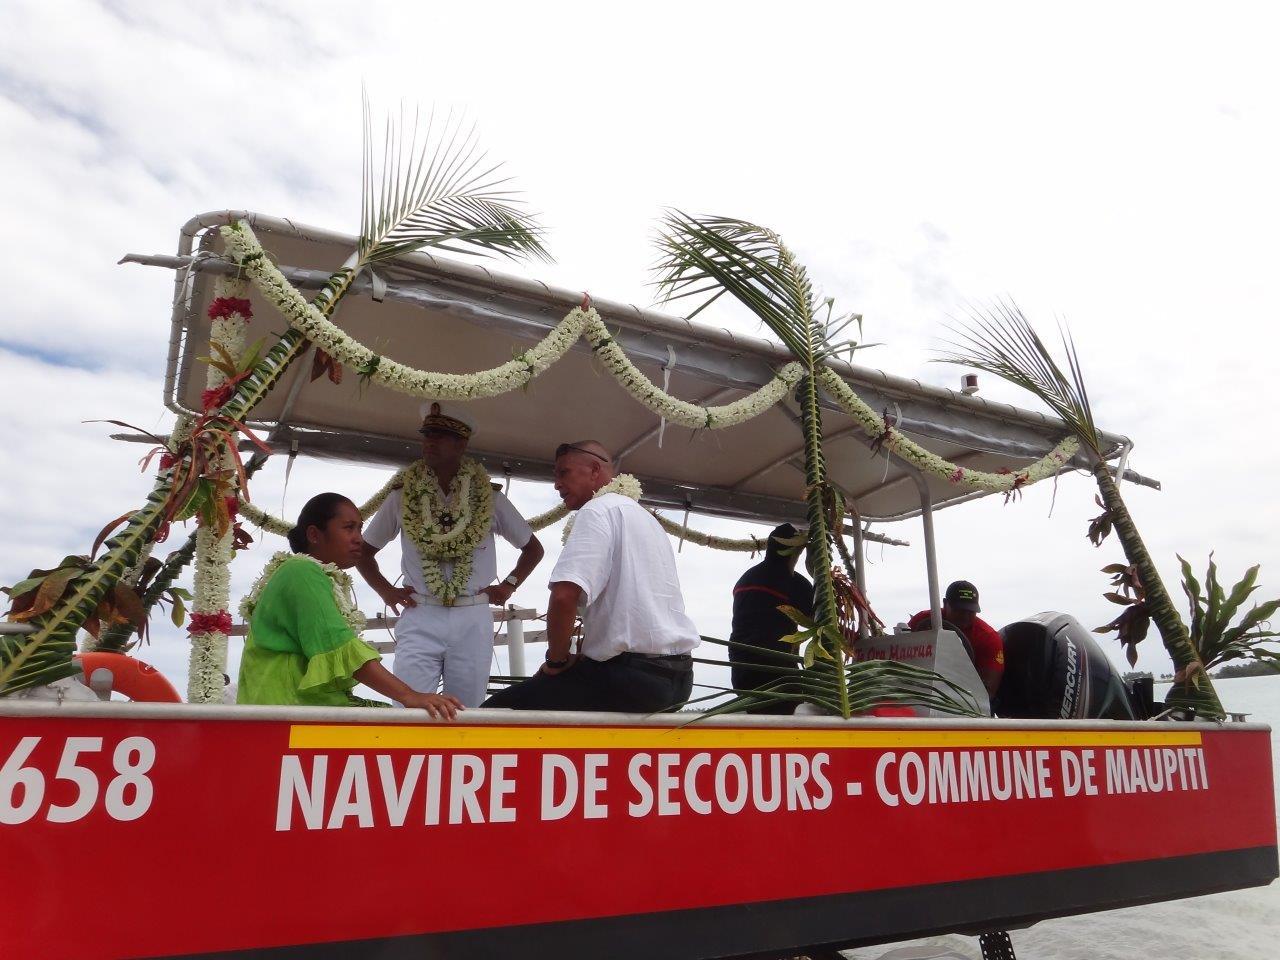 Maupiti inaugure sa nouvelle vedette de secours en mer